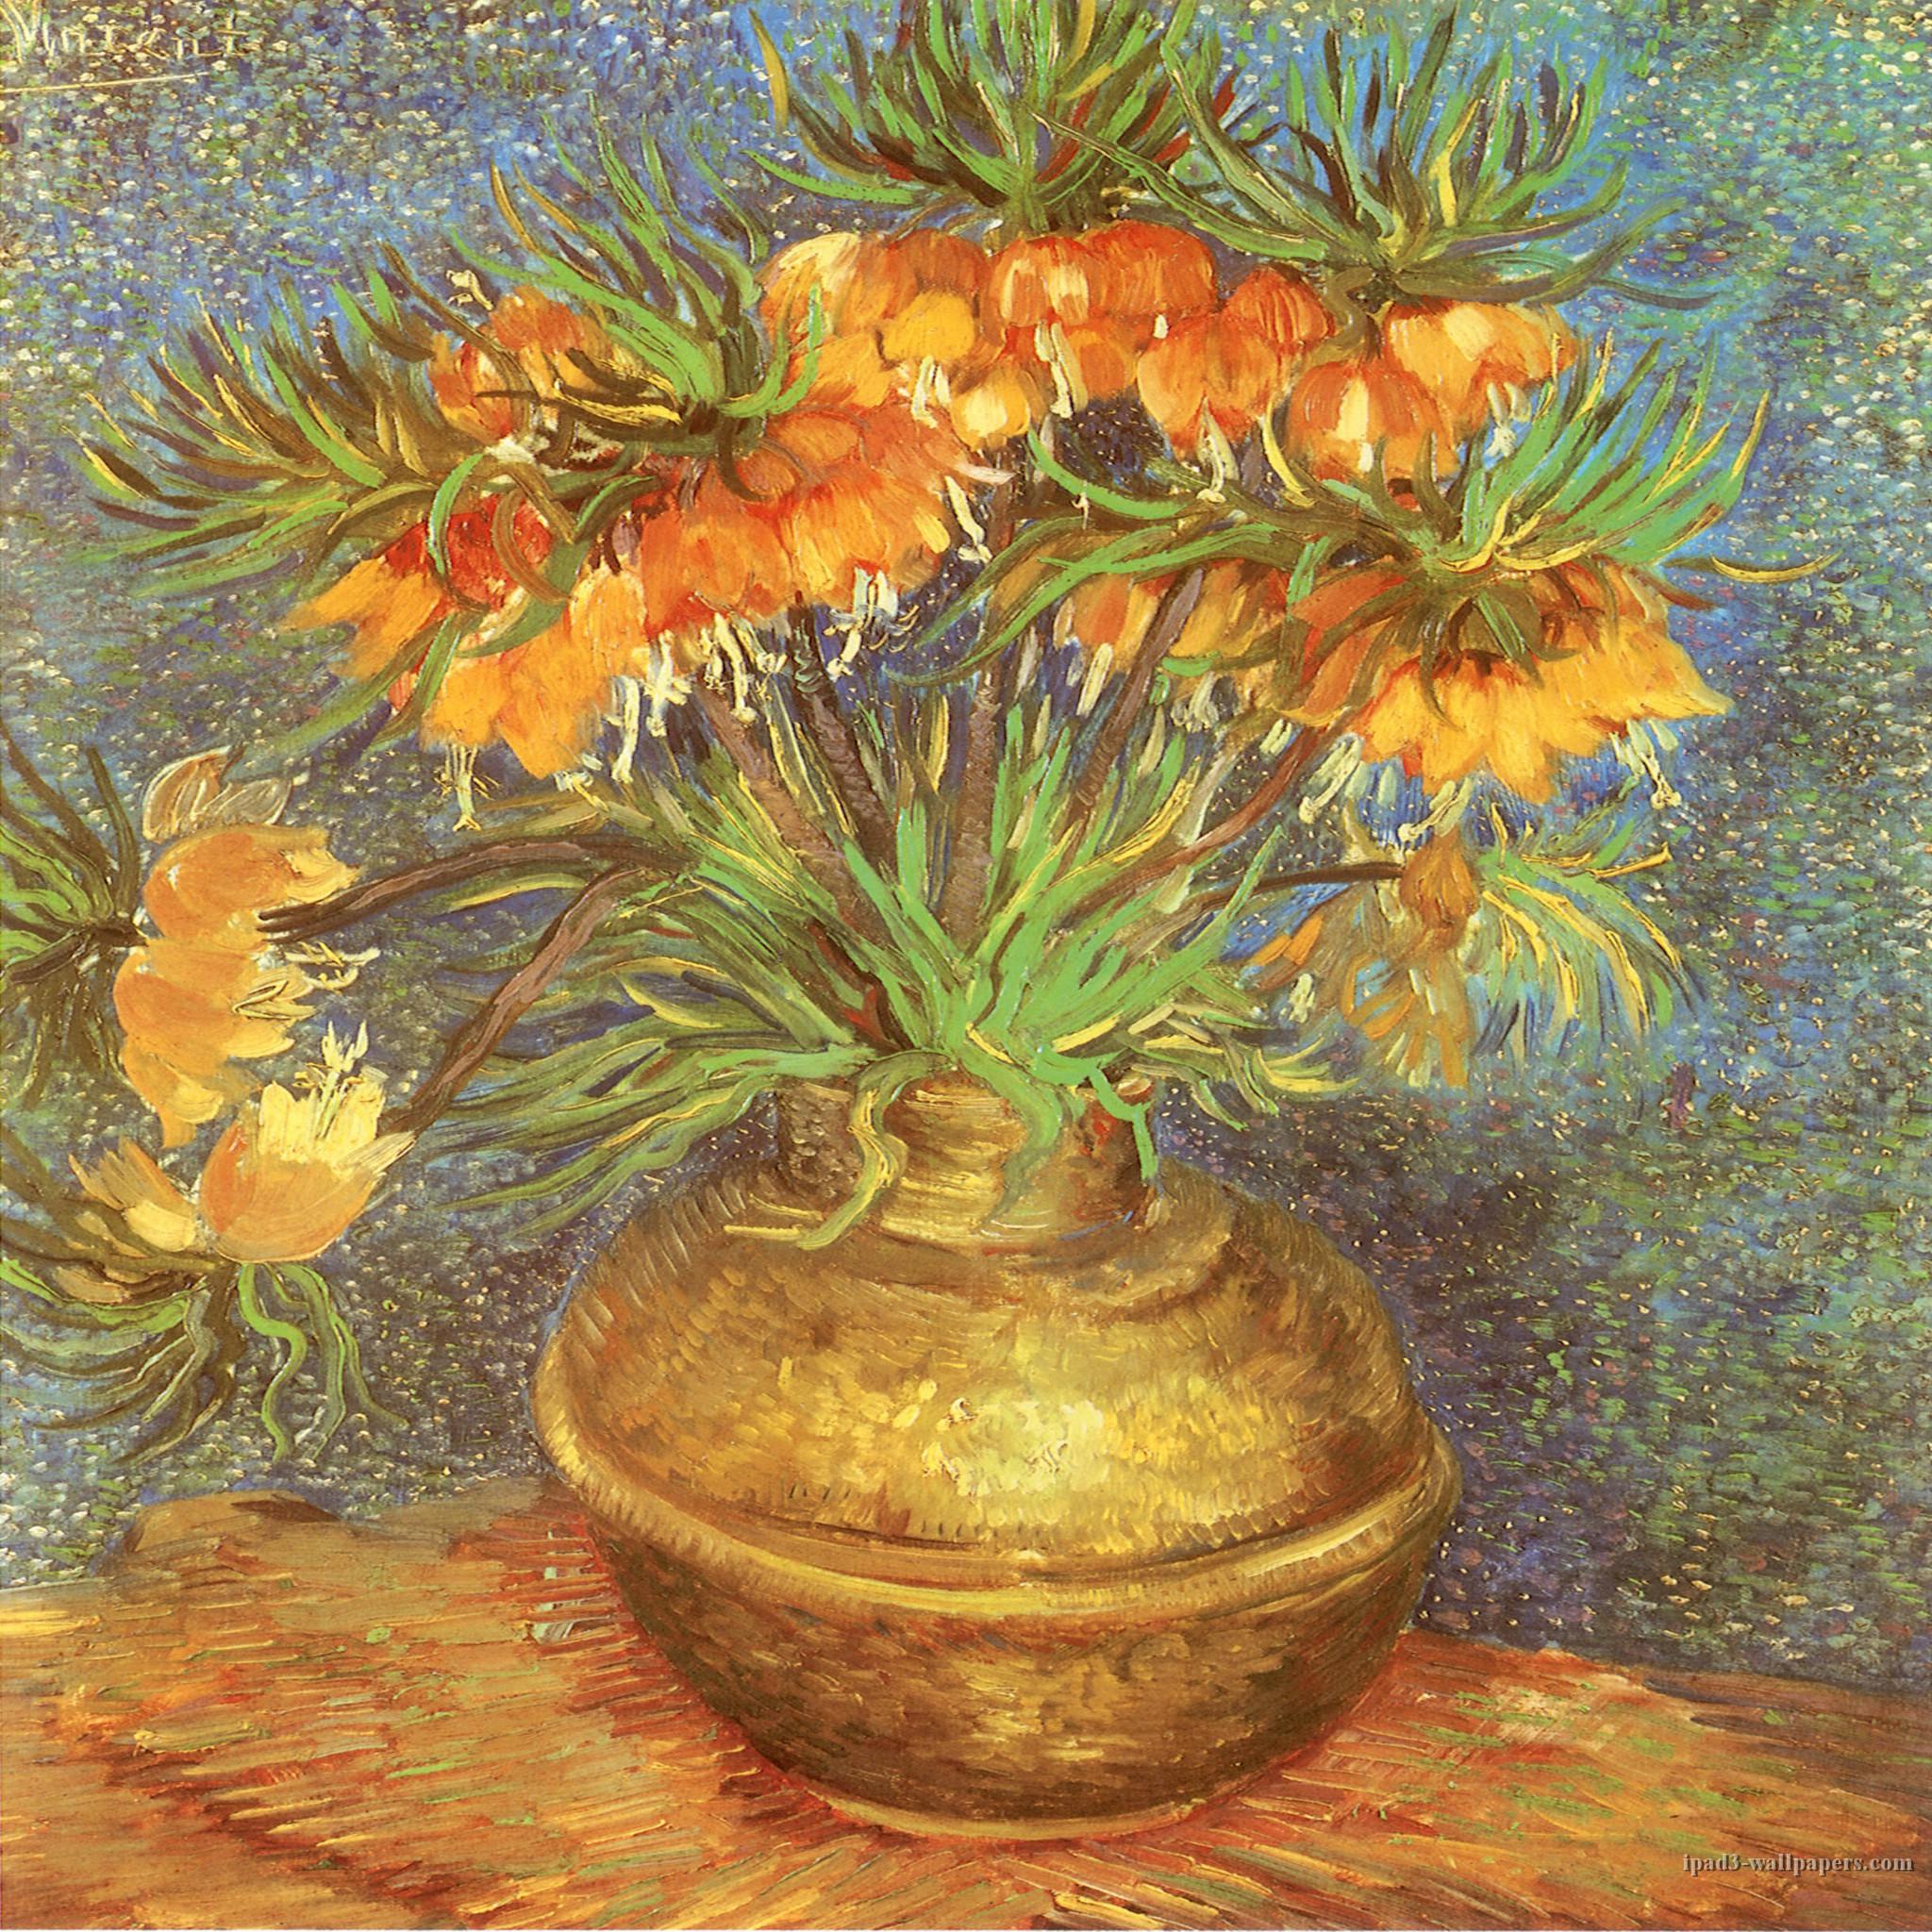 Van Gogh Wallpaper: Van Gogh Wallpapers